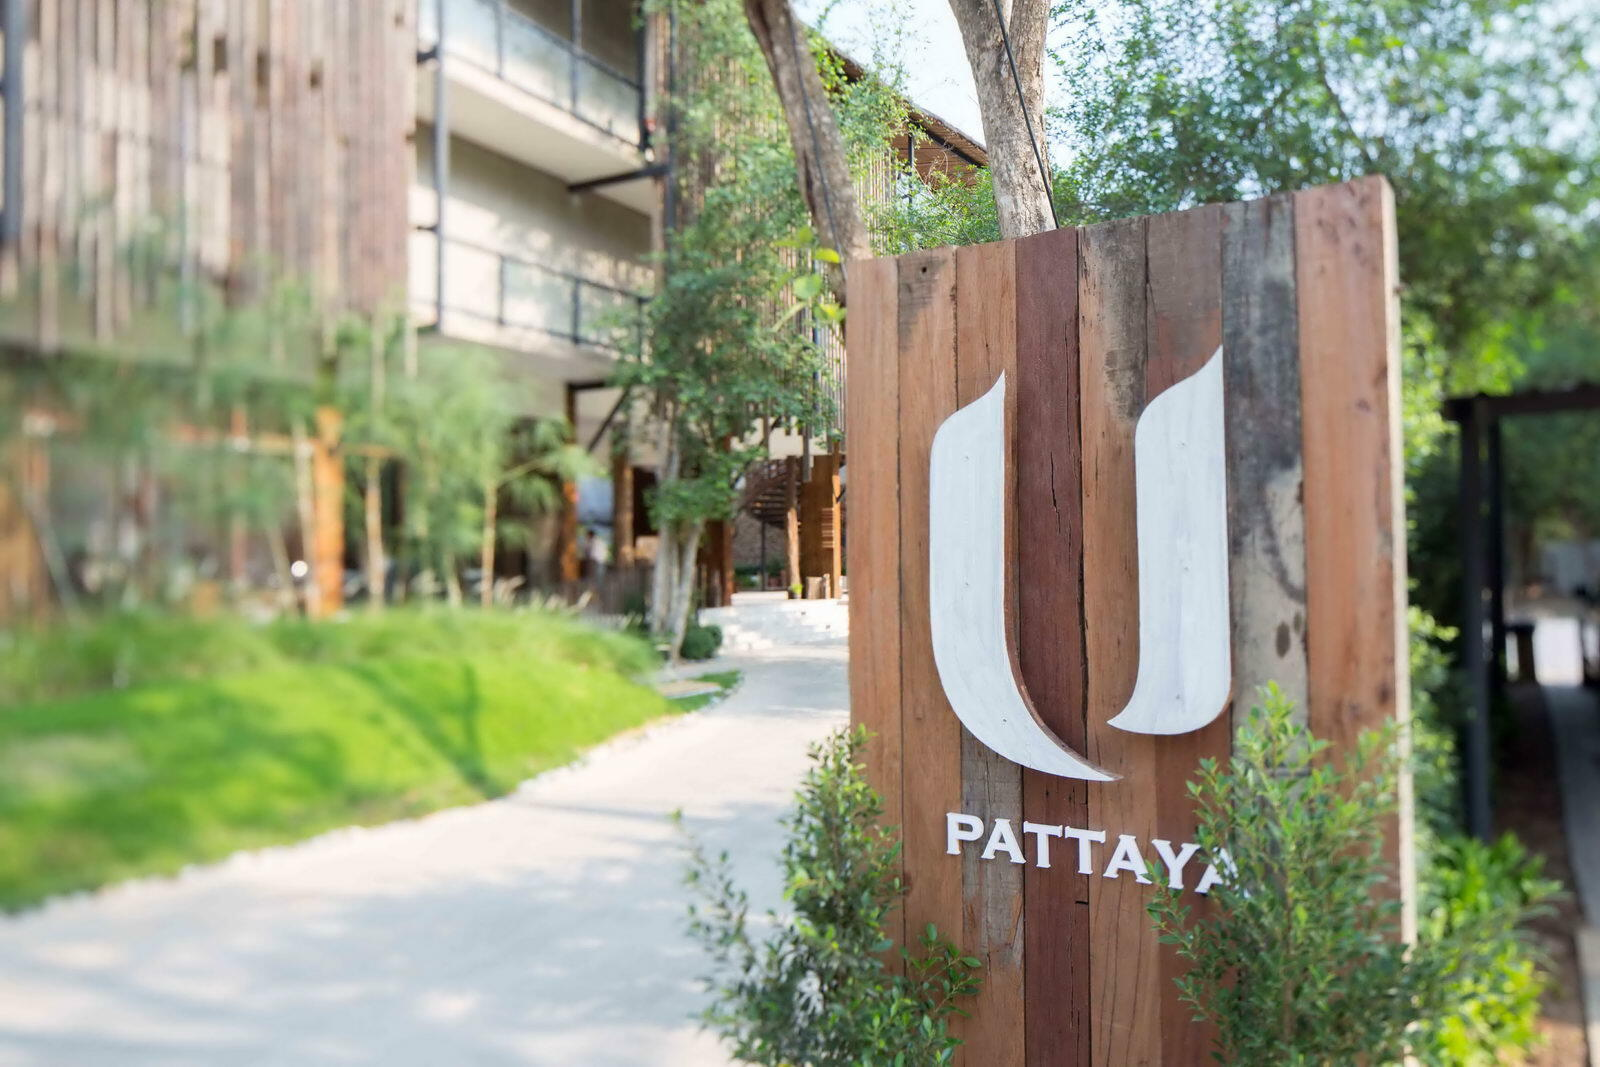 U Pattaya Hotel Entrance